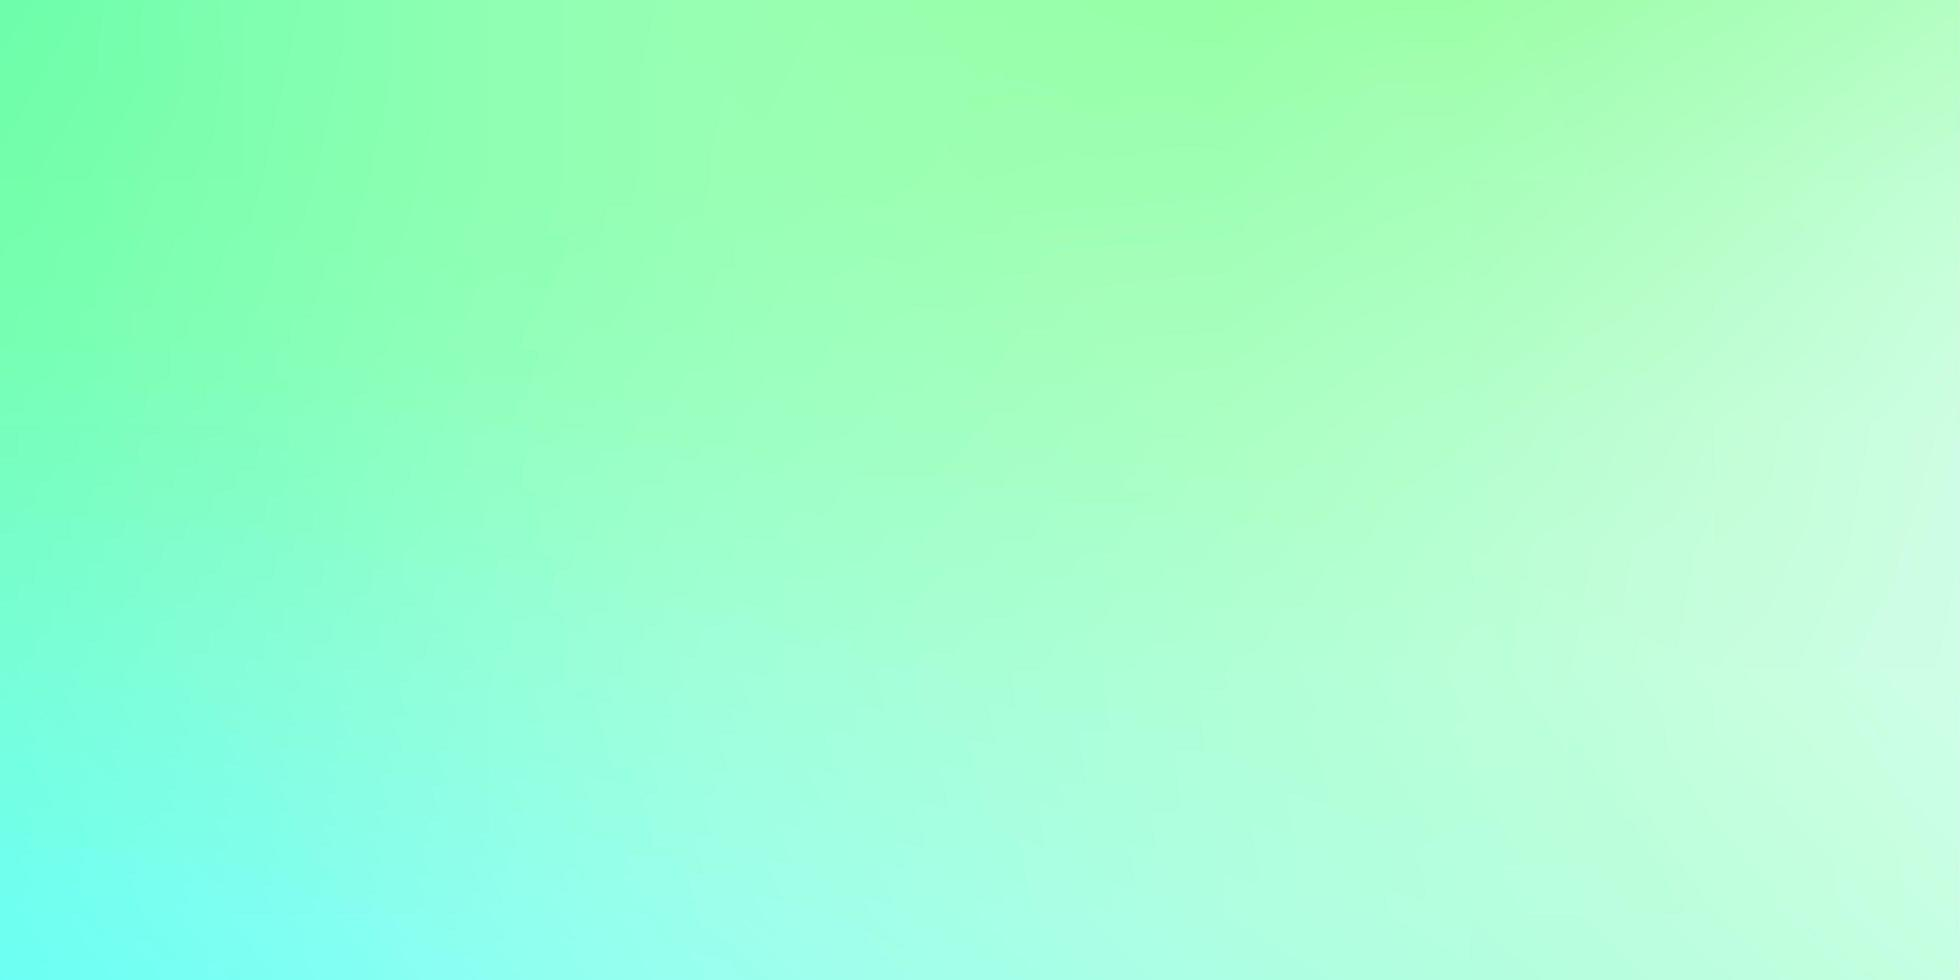 textura turva inteligente de vetor verde claro.